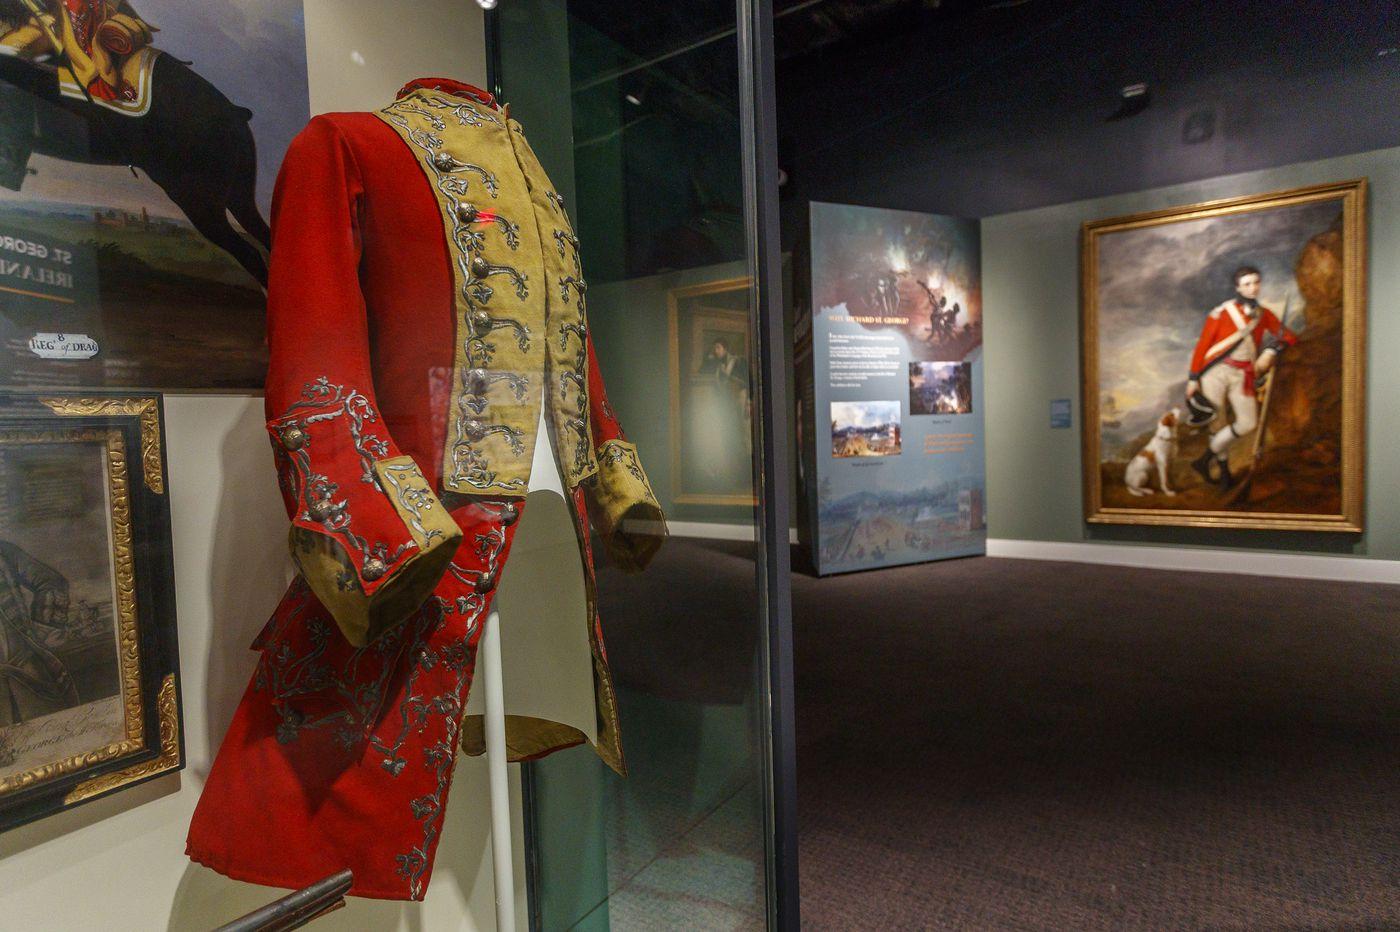 American Revolution museum's new 'Irish Soldier' exhibit has it all: Love. Death. Psychodrama.